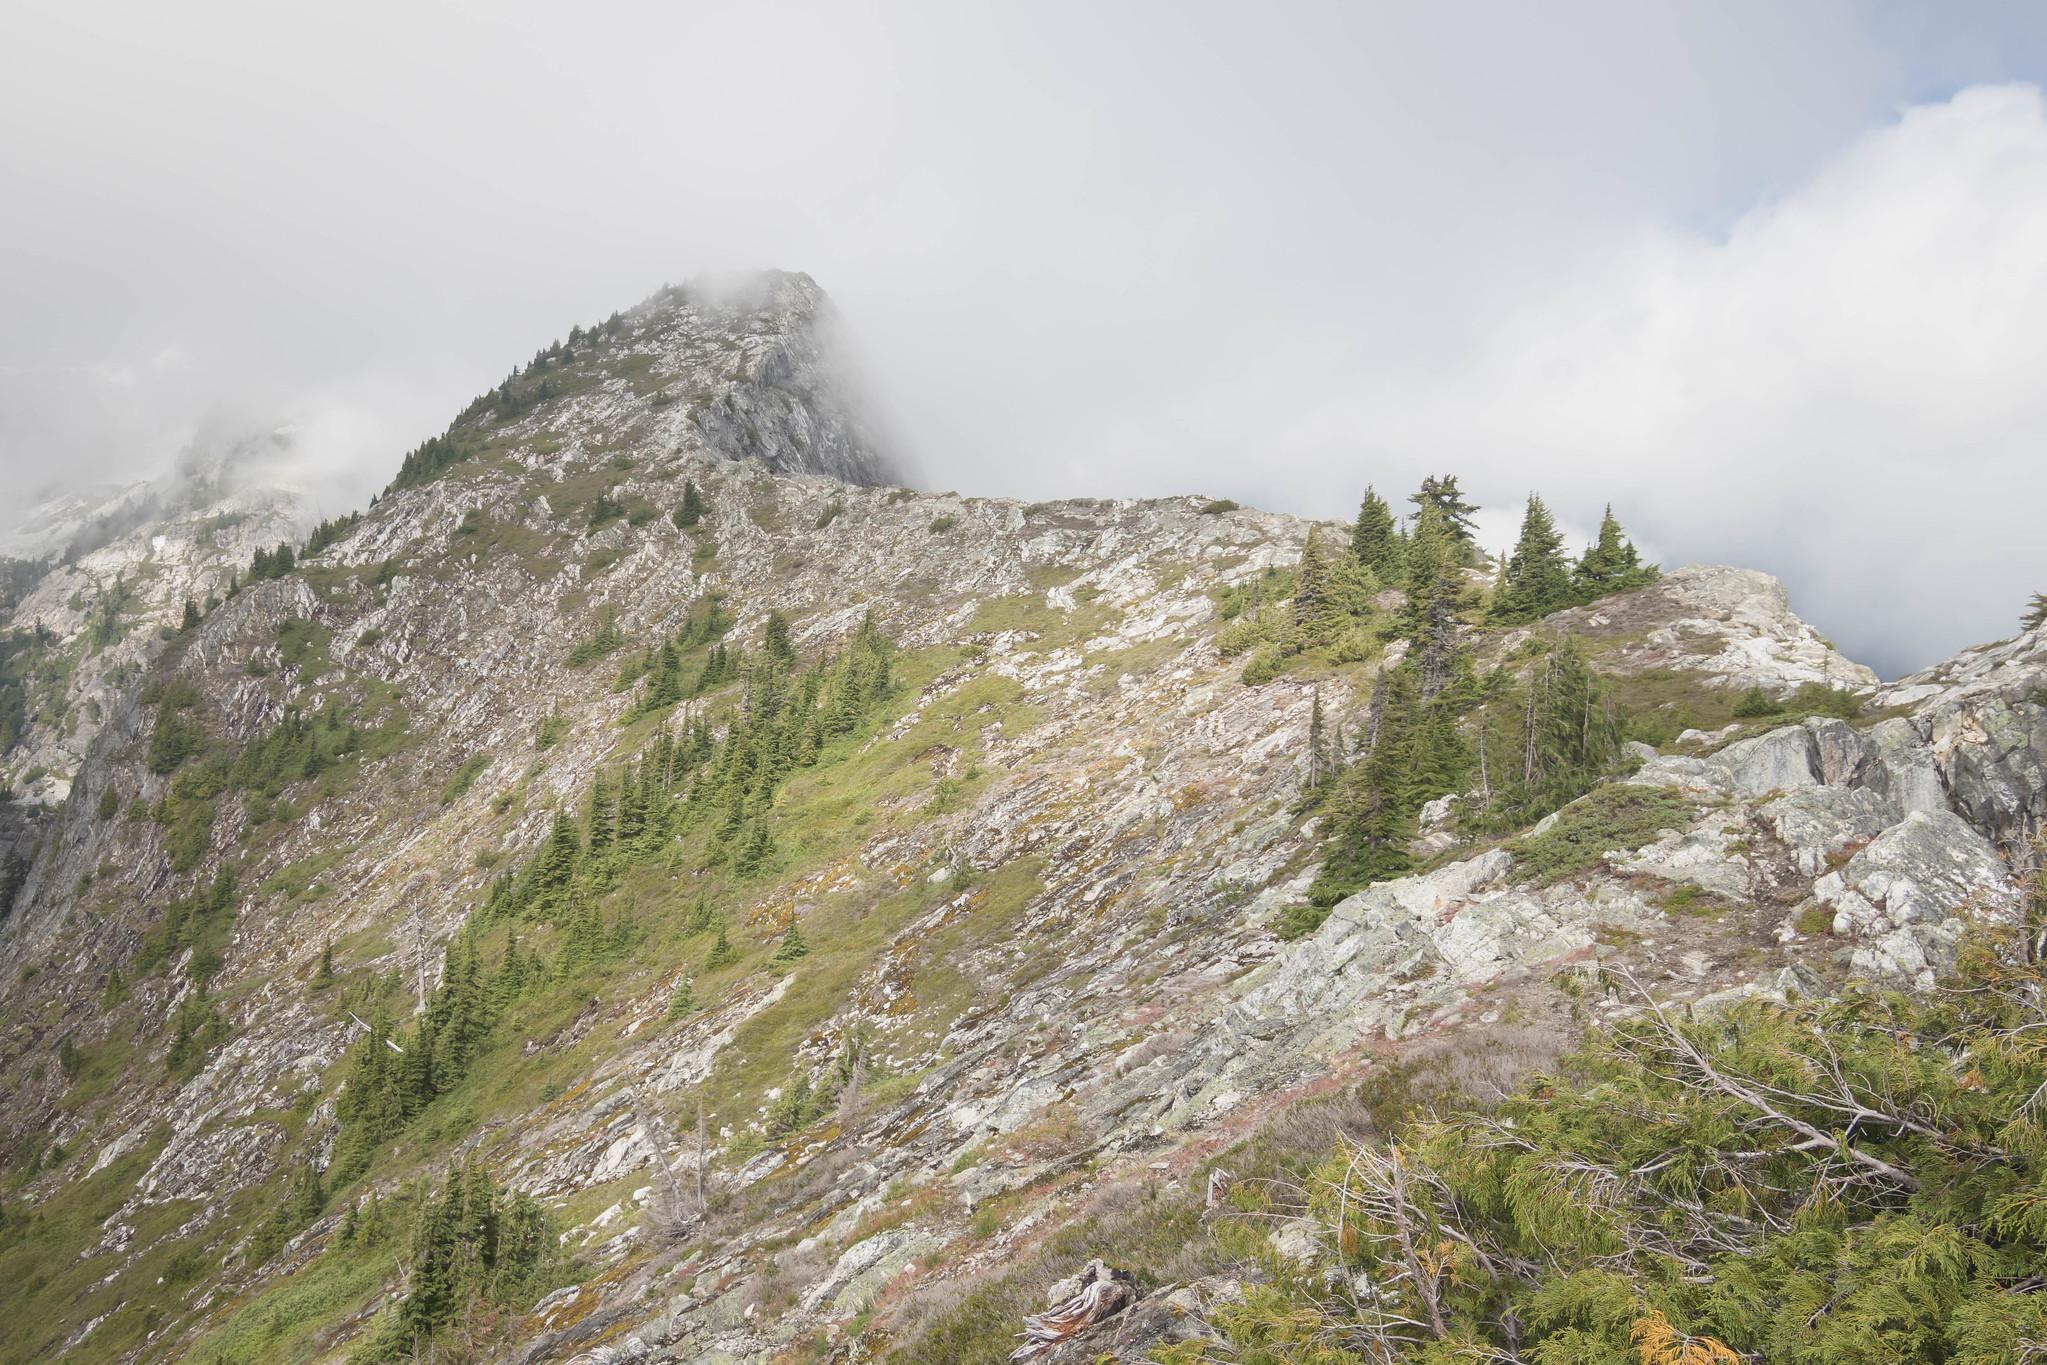 Connecting ridgeline to X Mountain